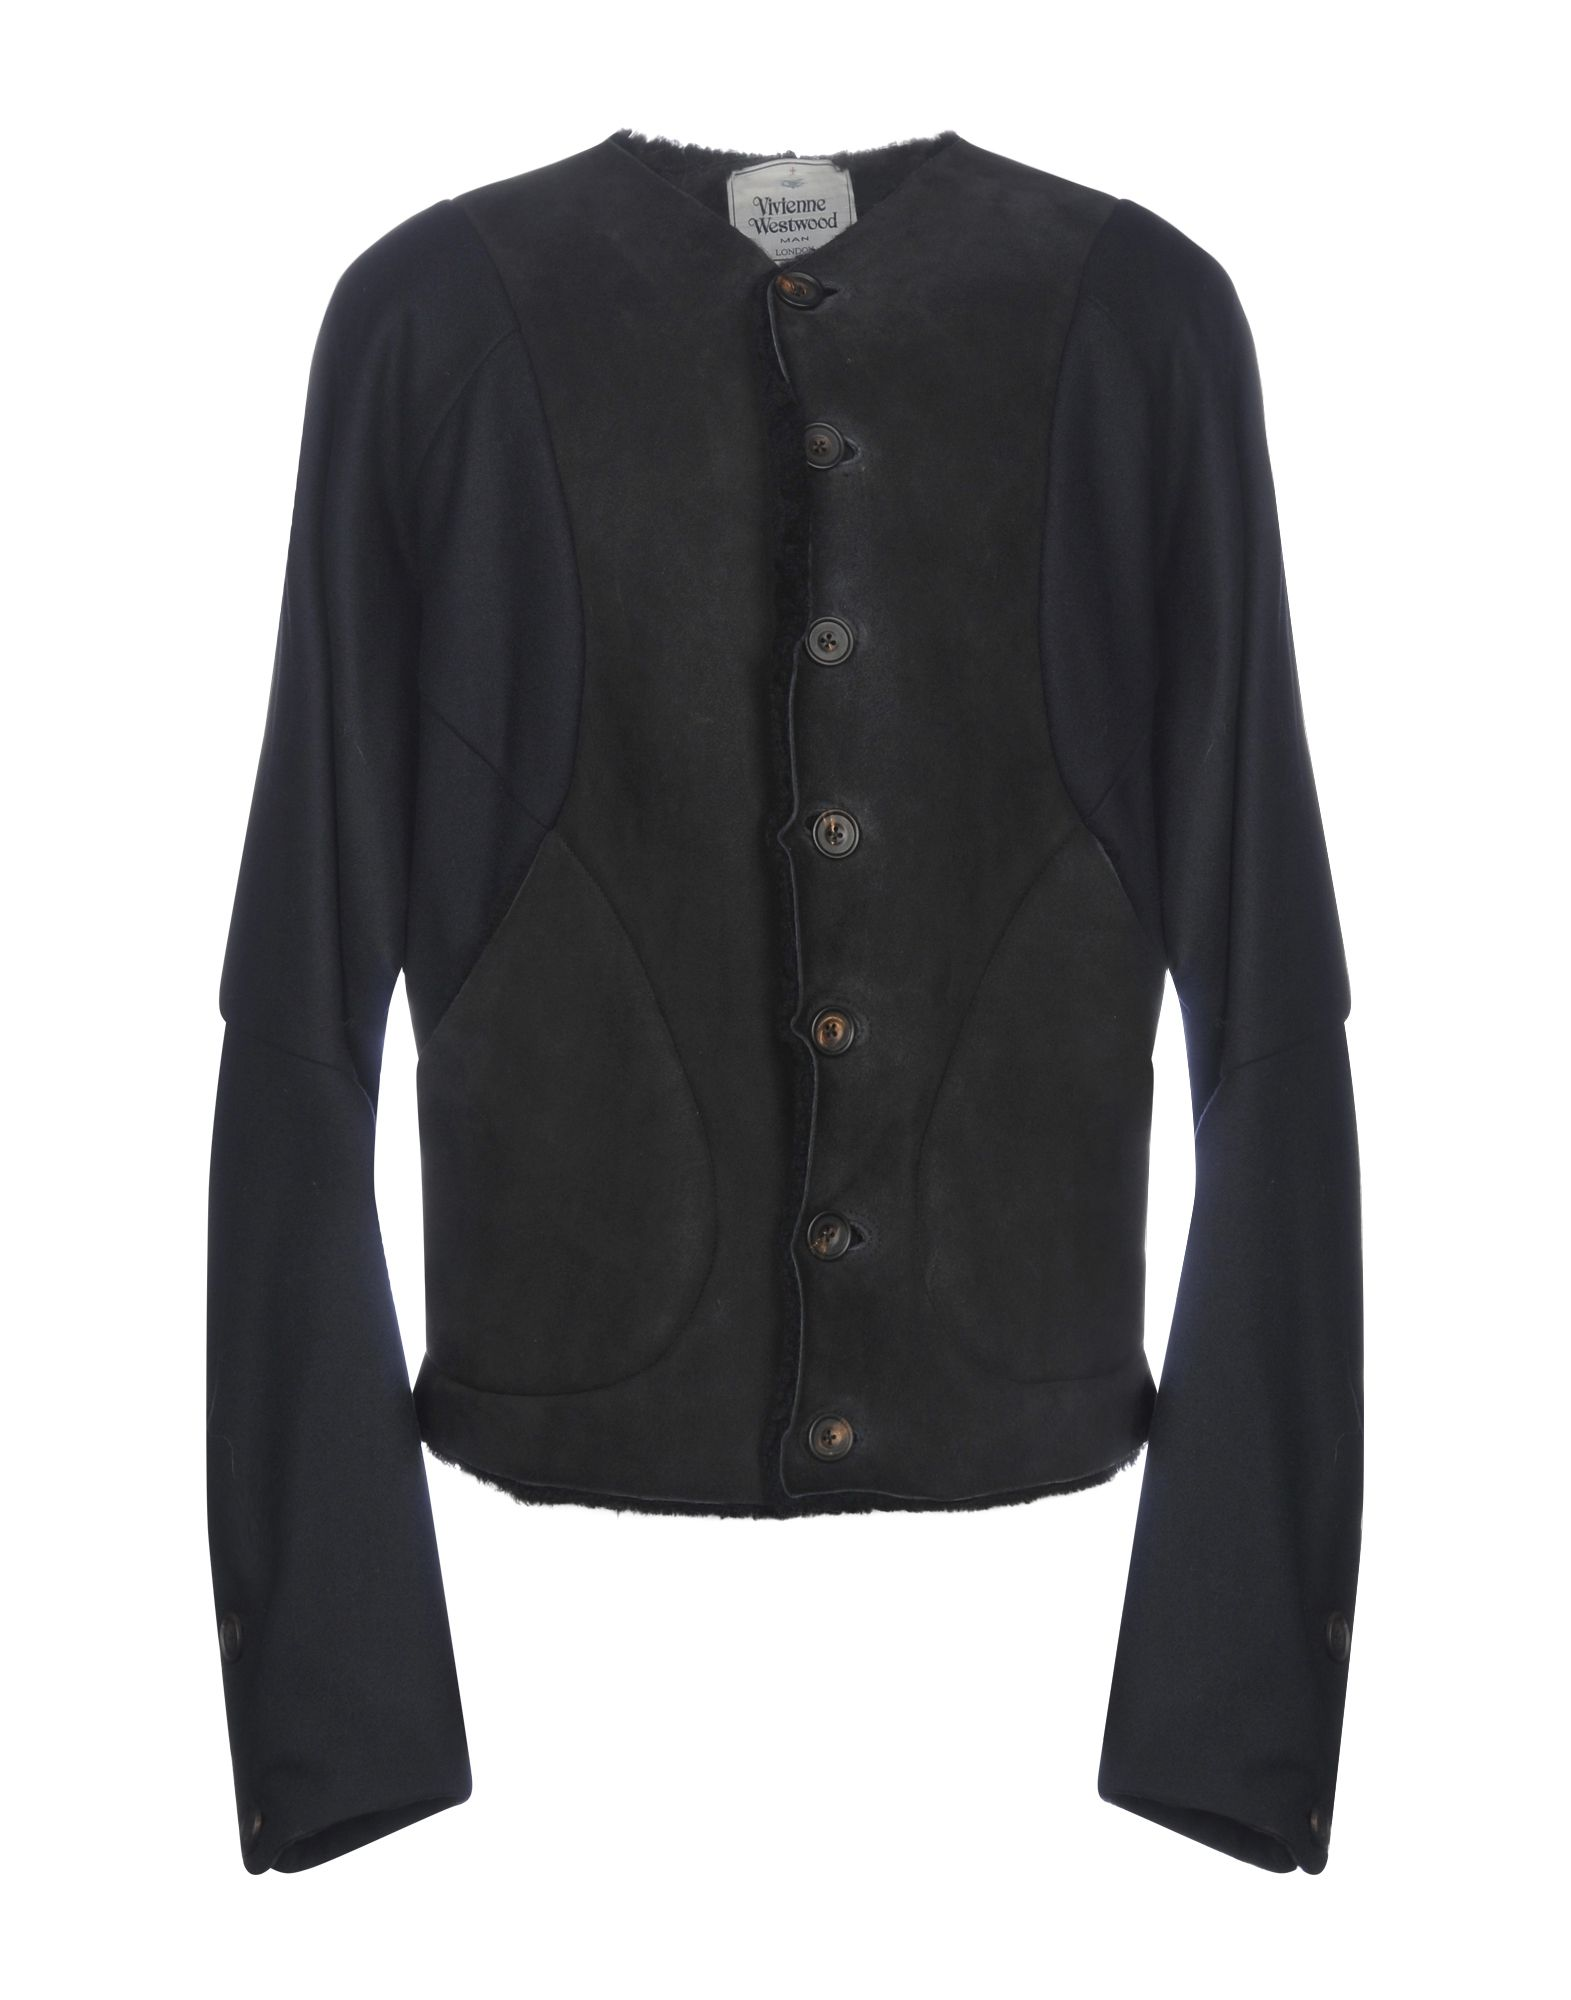 VIVIENNE WESTWOOD MAN Leather Jacket in Dark Green